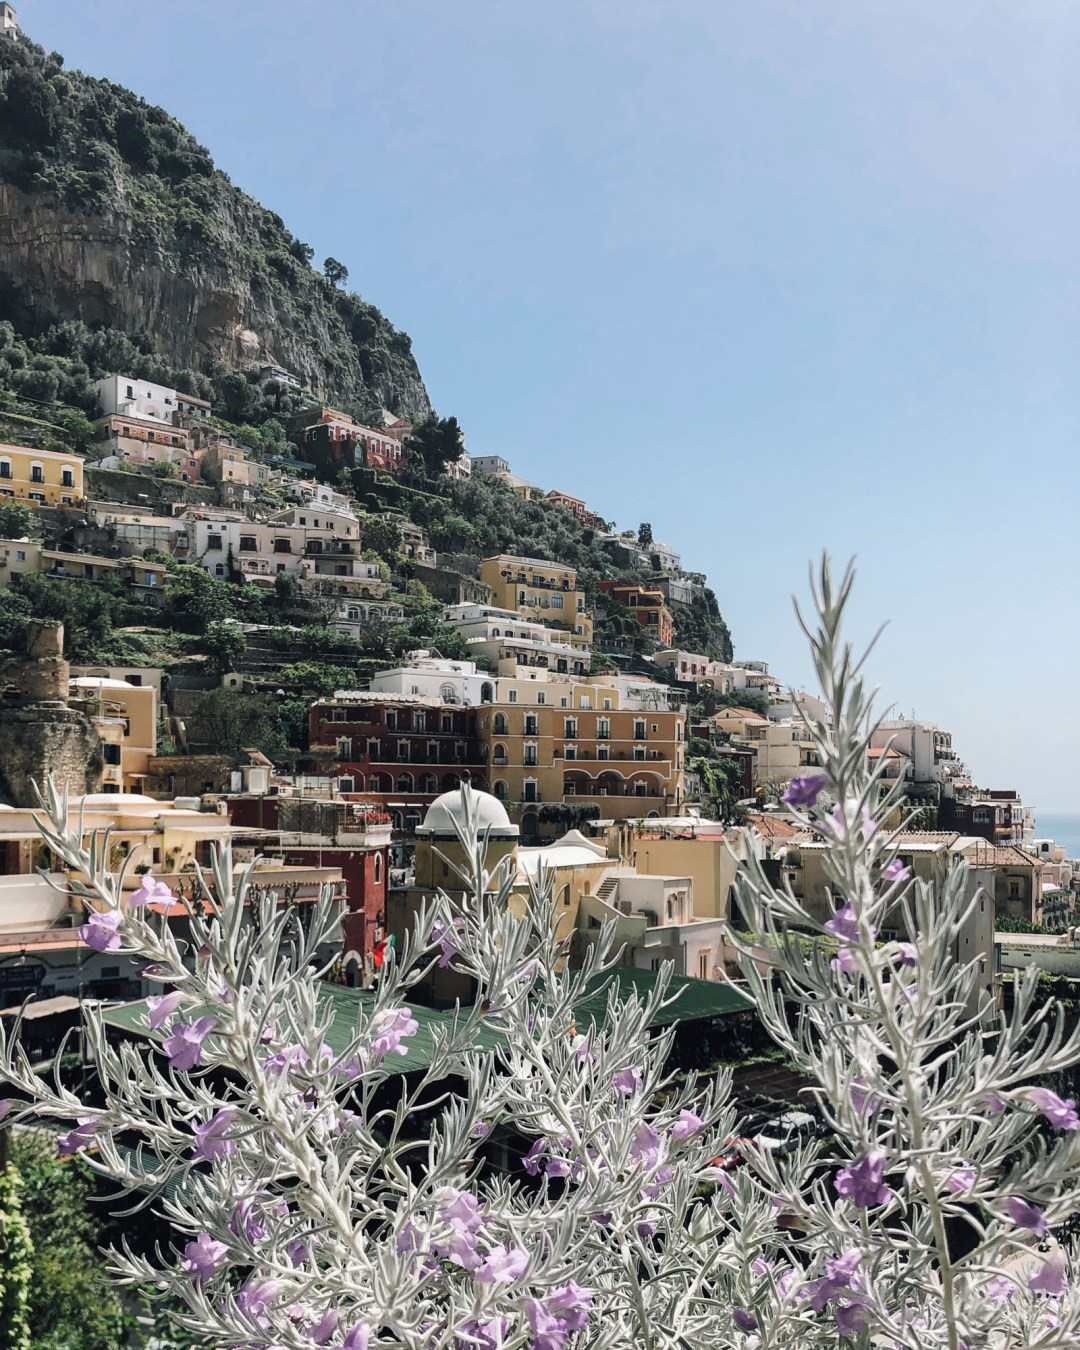 inastil, amalfikueste, urlaub, italien, sorrent, amalfi, positano, capri, luxusurlaub, cabrio, roadtrip, over50blogger, sommermode, ue50style, reiseblogger, reisebericht, traveldiary, reisetipps-44